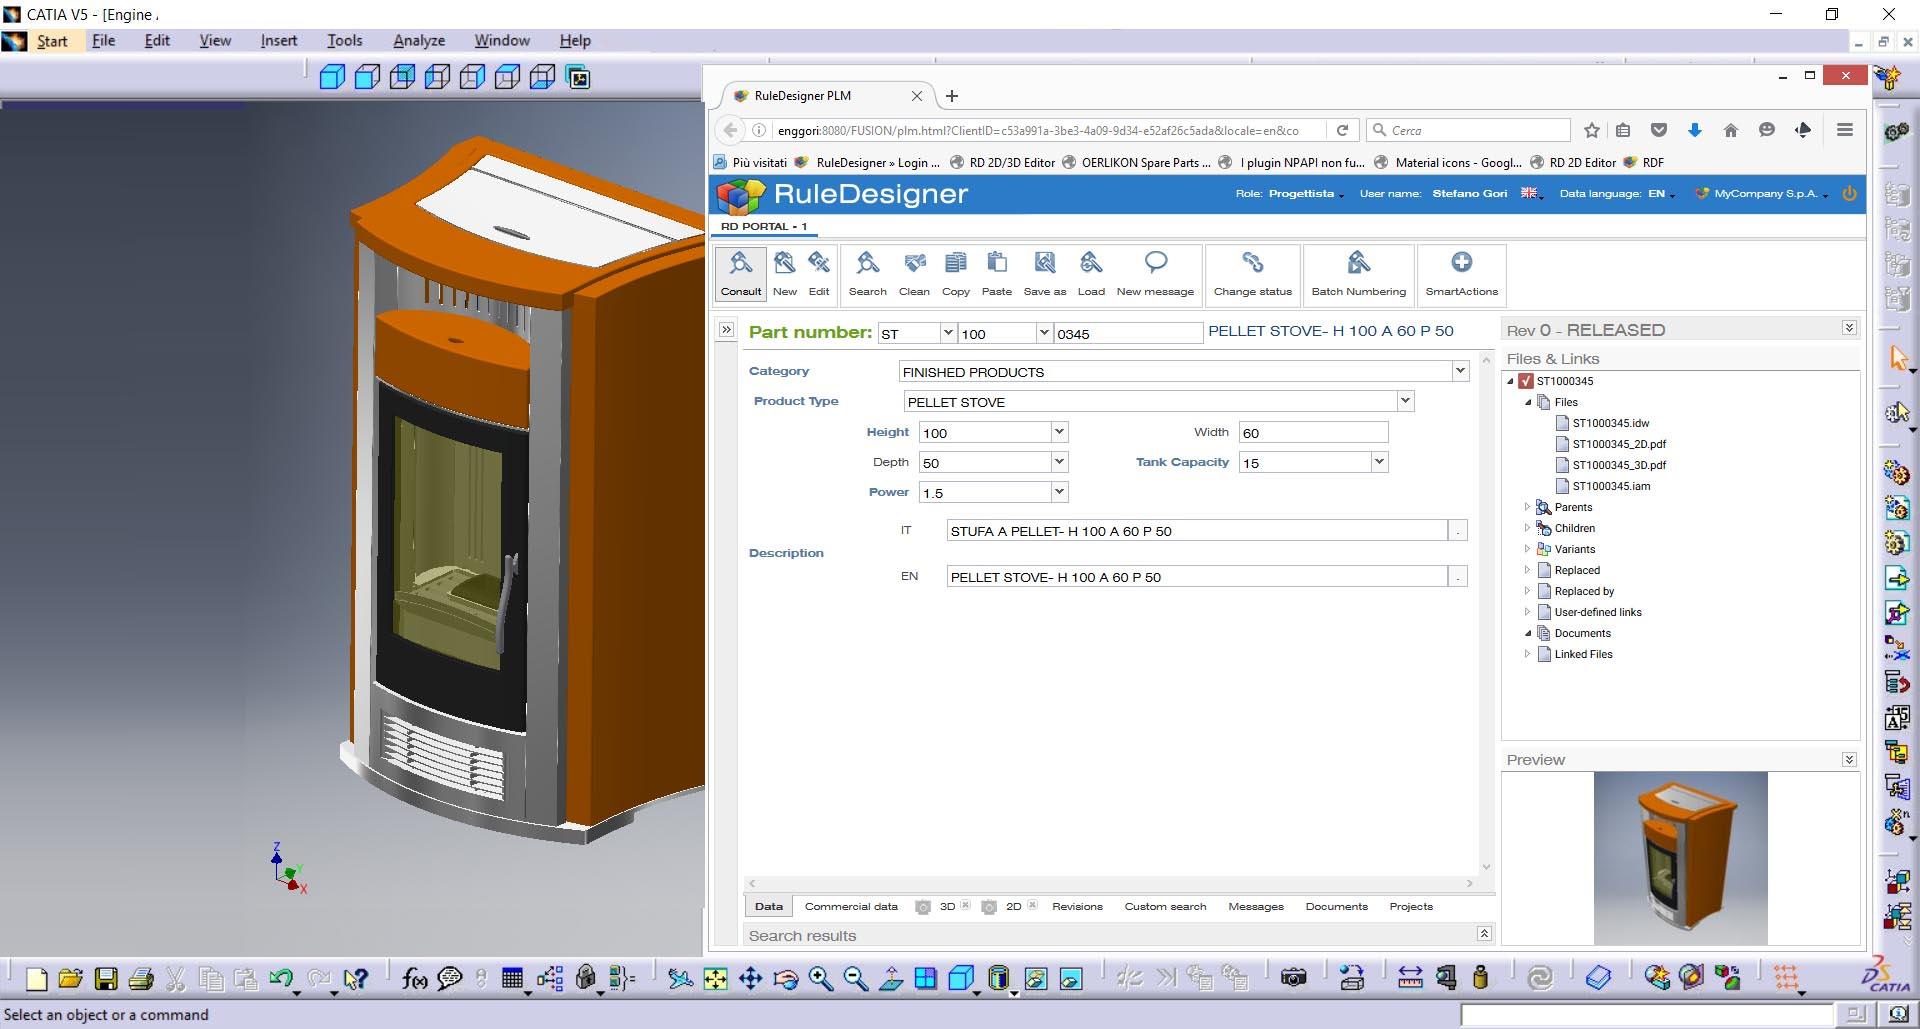 RuleDesigner PDM integrato con CATIA